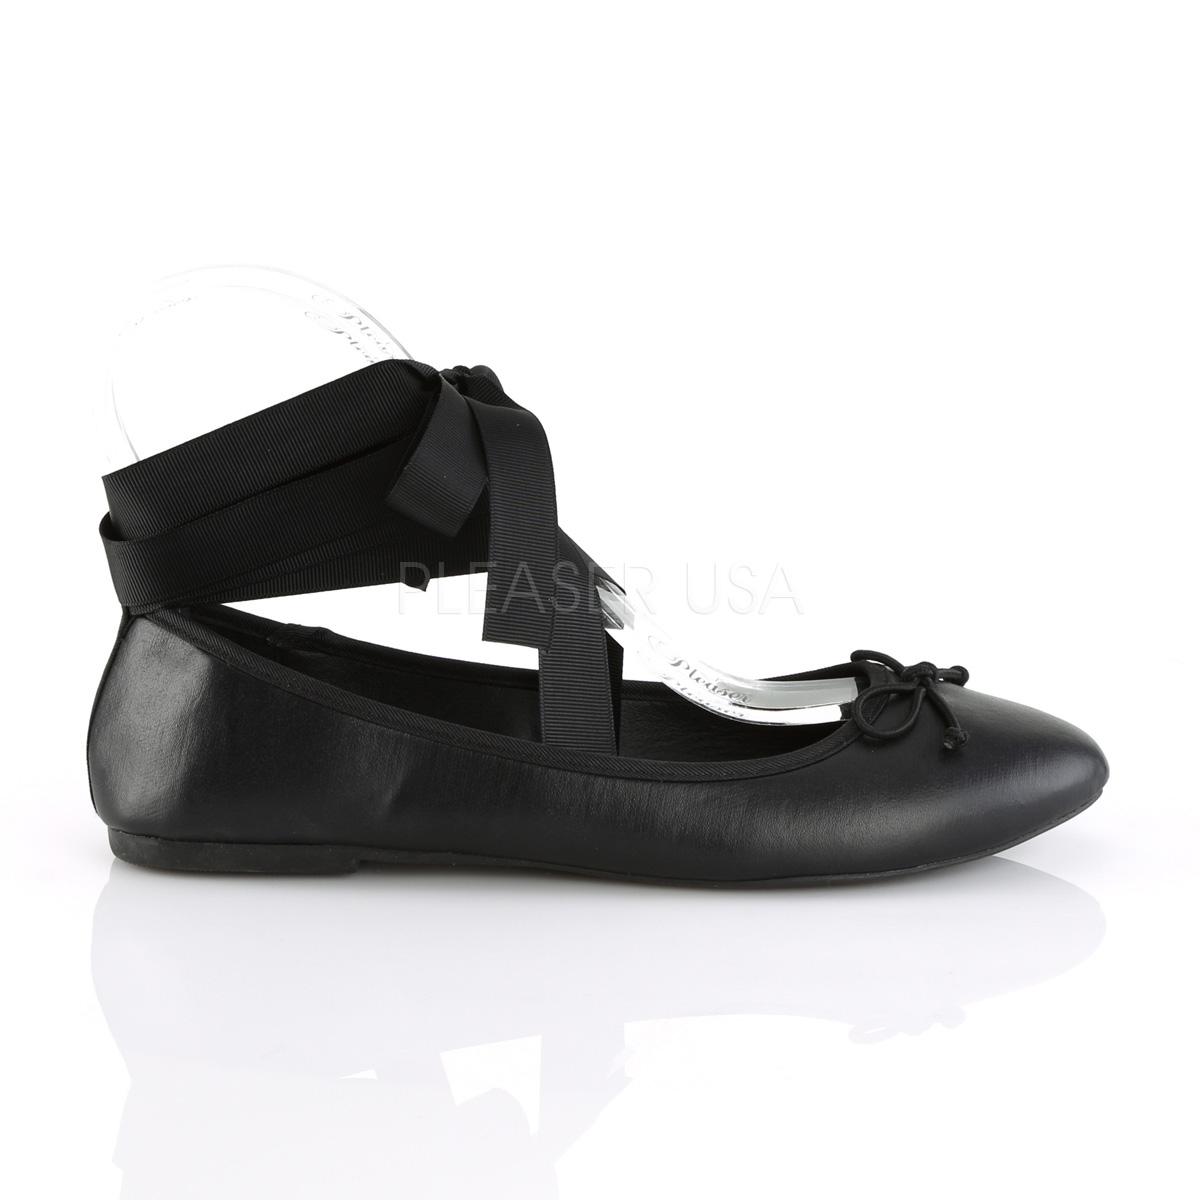 Leatherette DEMONIA DRAC 03 ballerinas flat womens shoes